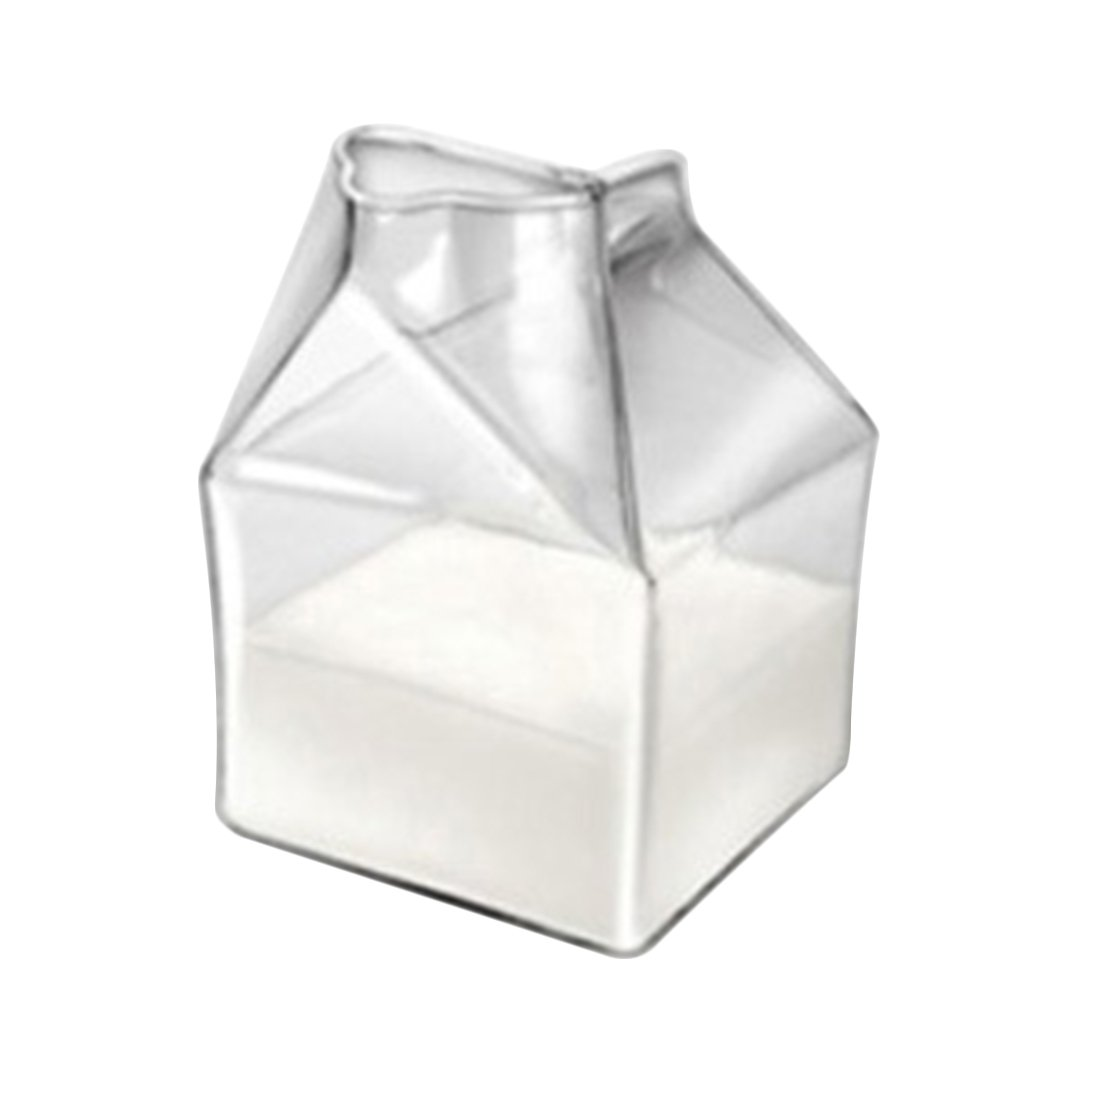 CT-Tribe 200ML Half Pint Blown Glass Mini Milk Creamer Carton Container Milk Box Drink Beverage Mug Ware Bottle Clear